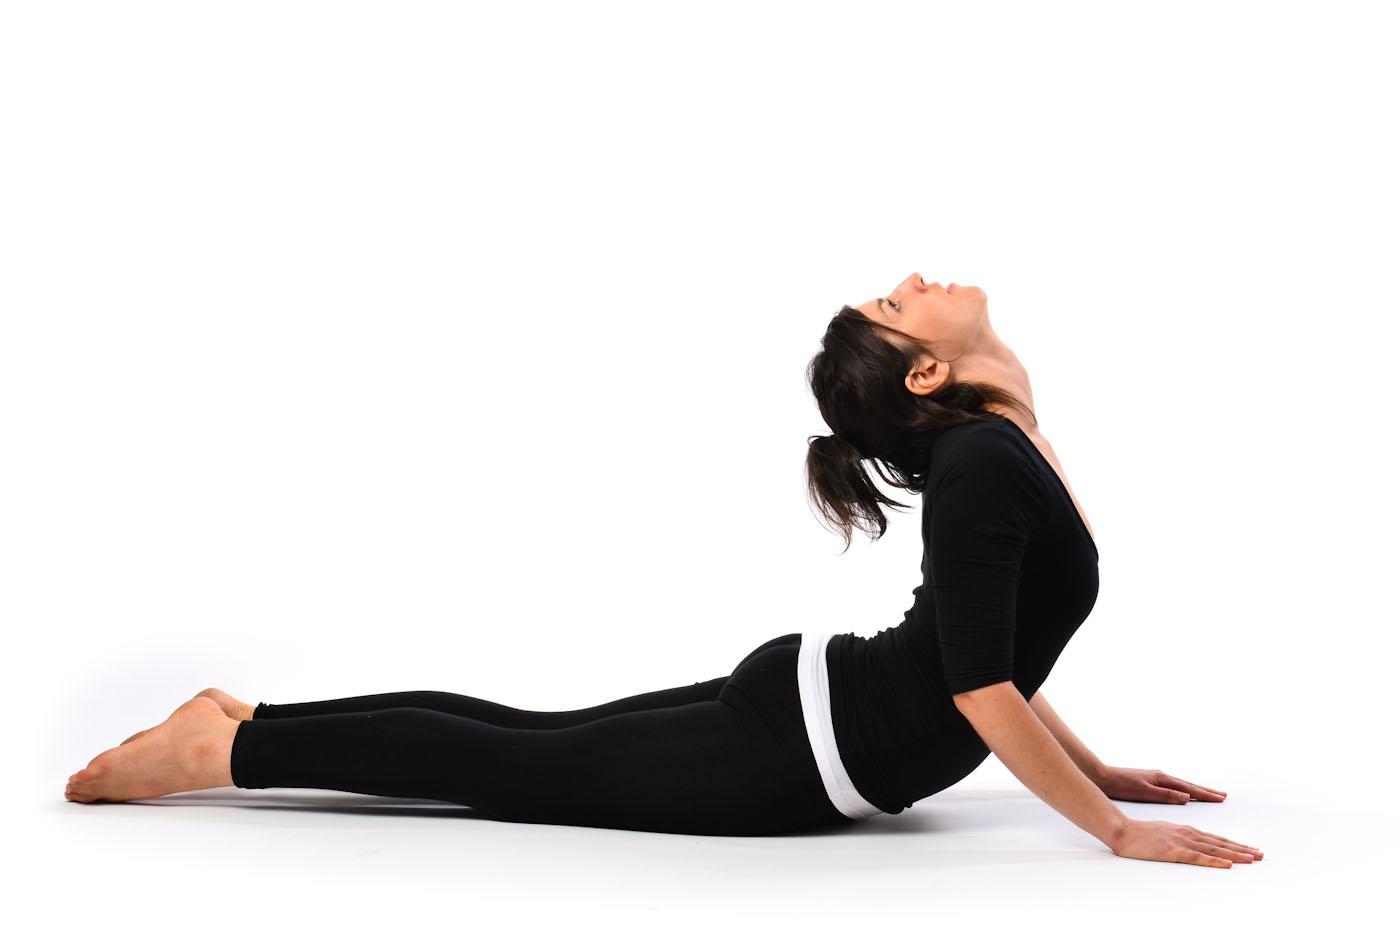 Benifits of Prone Position Asanas  Prone Yoga Poses  India